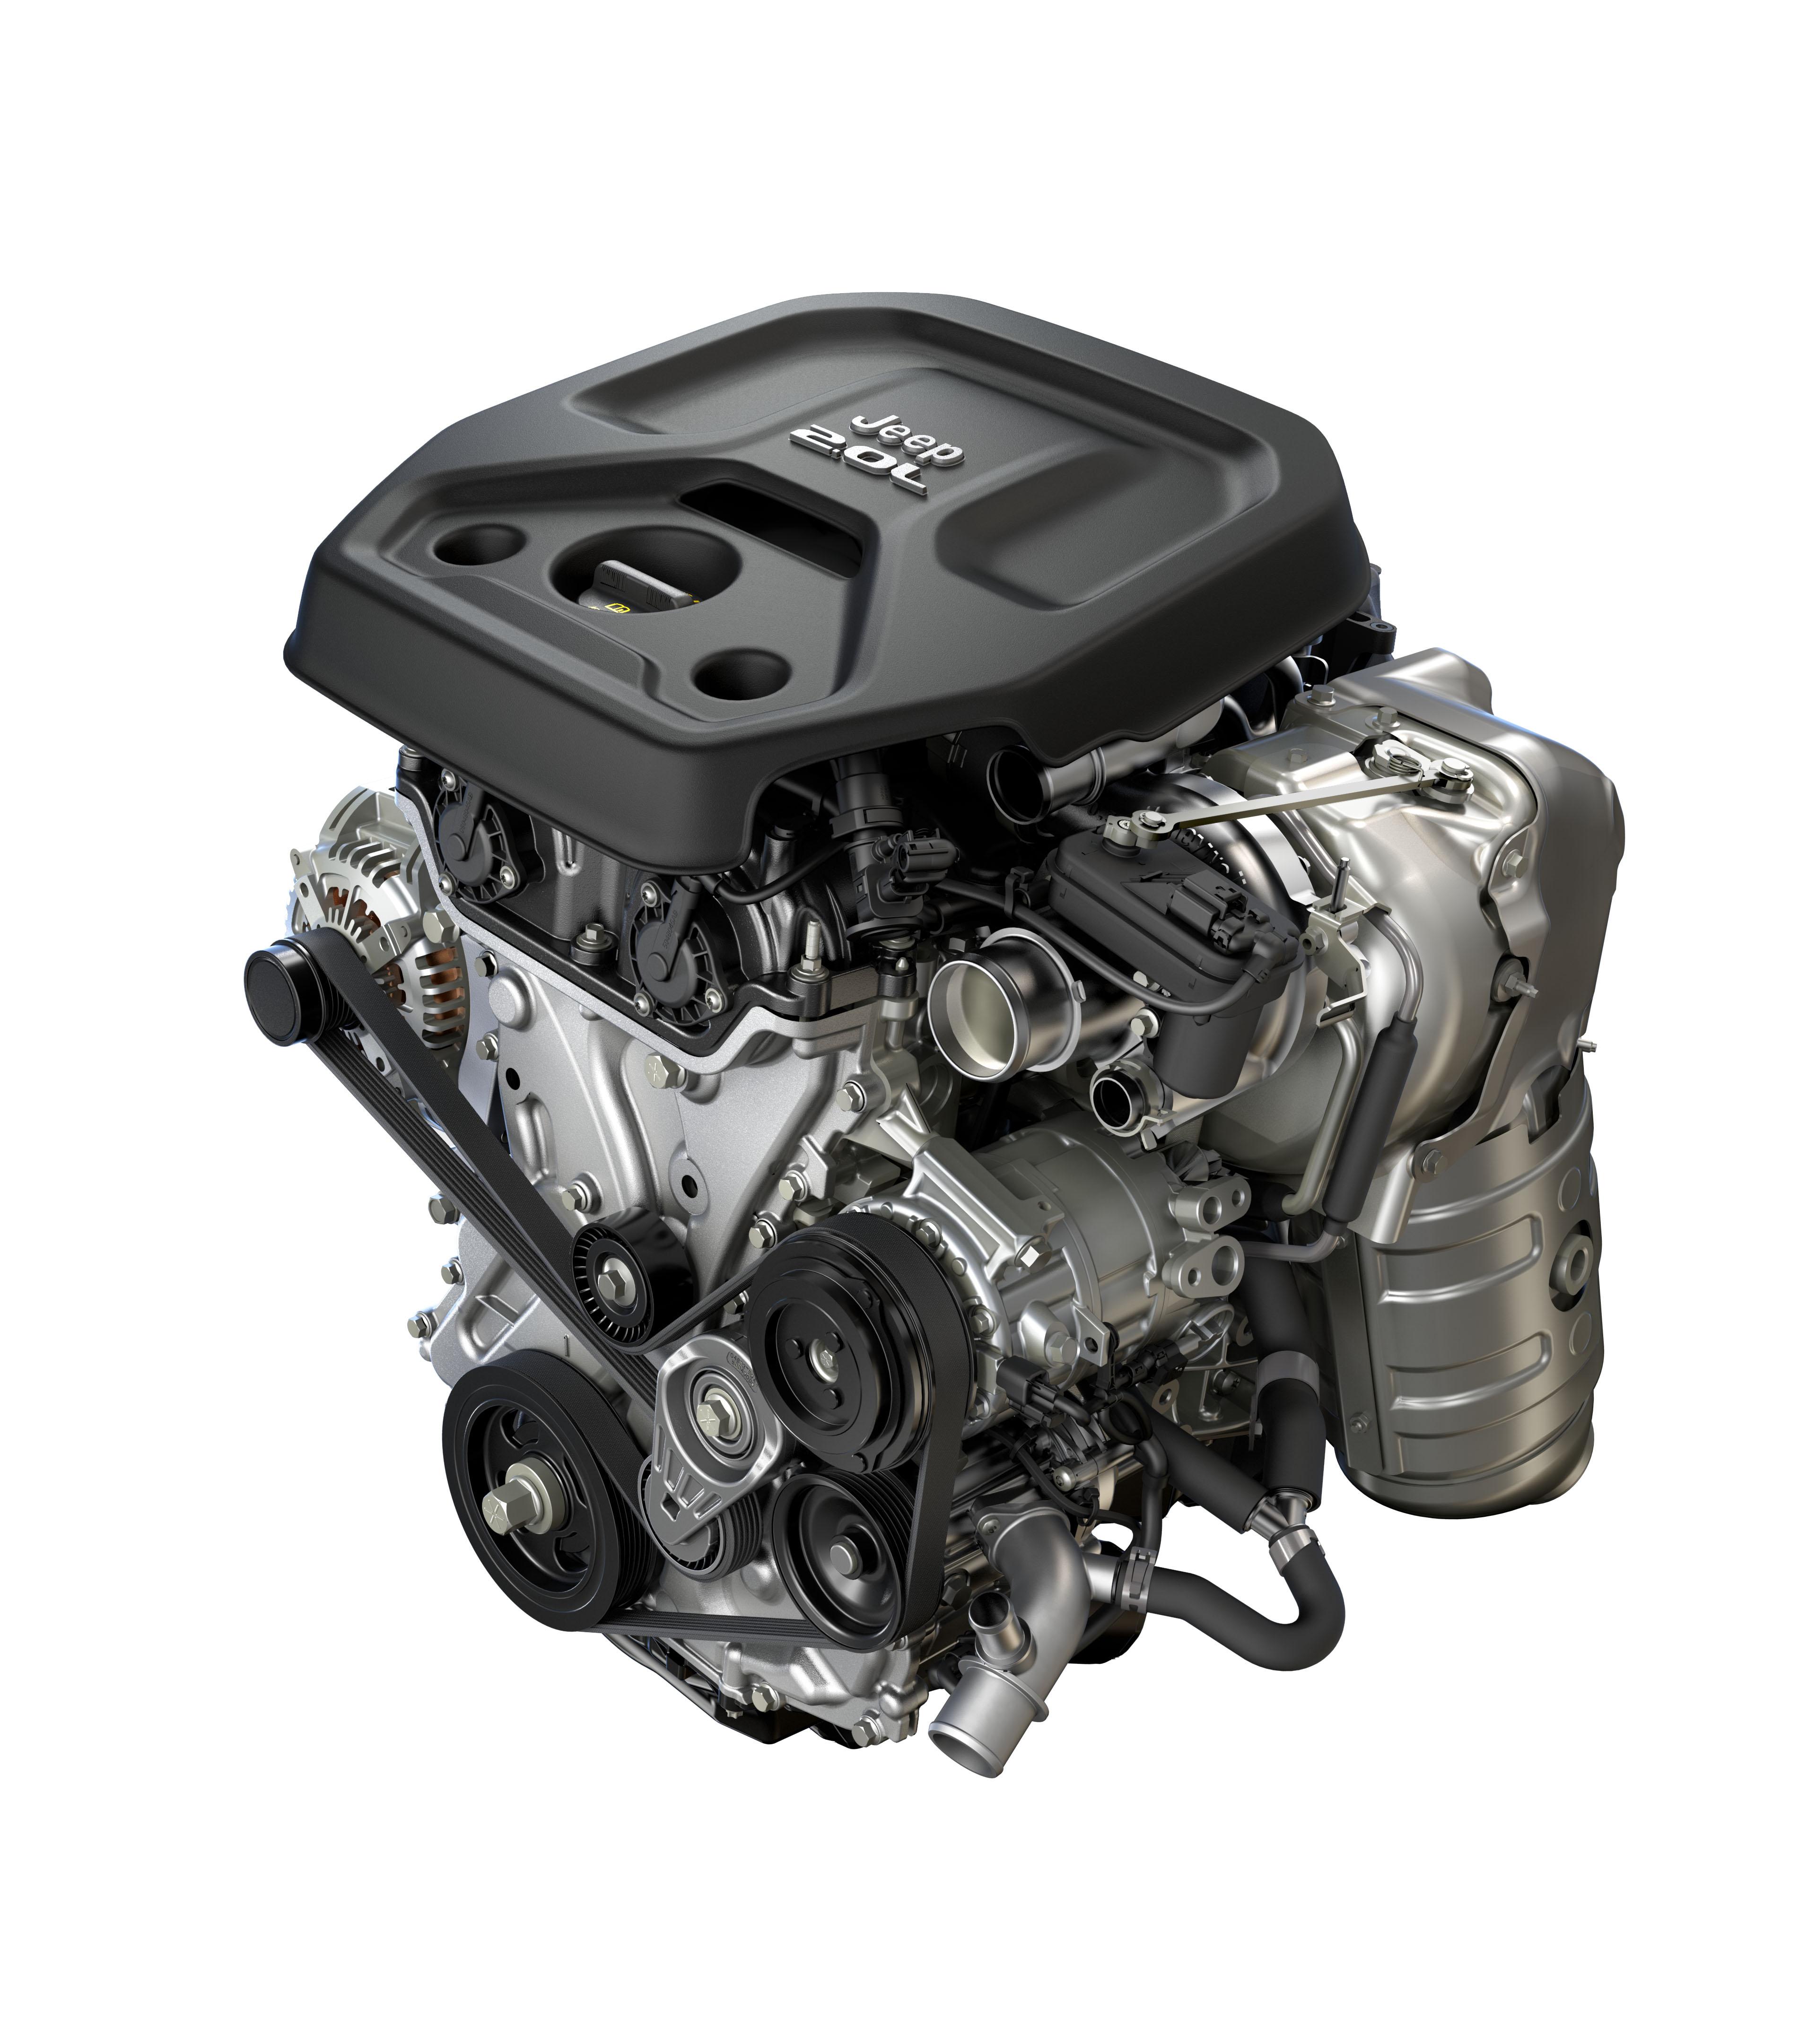 Road Test 2020 Toyota Corolla Hybrid: The Intelligent Driver